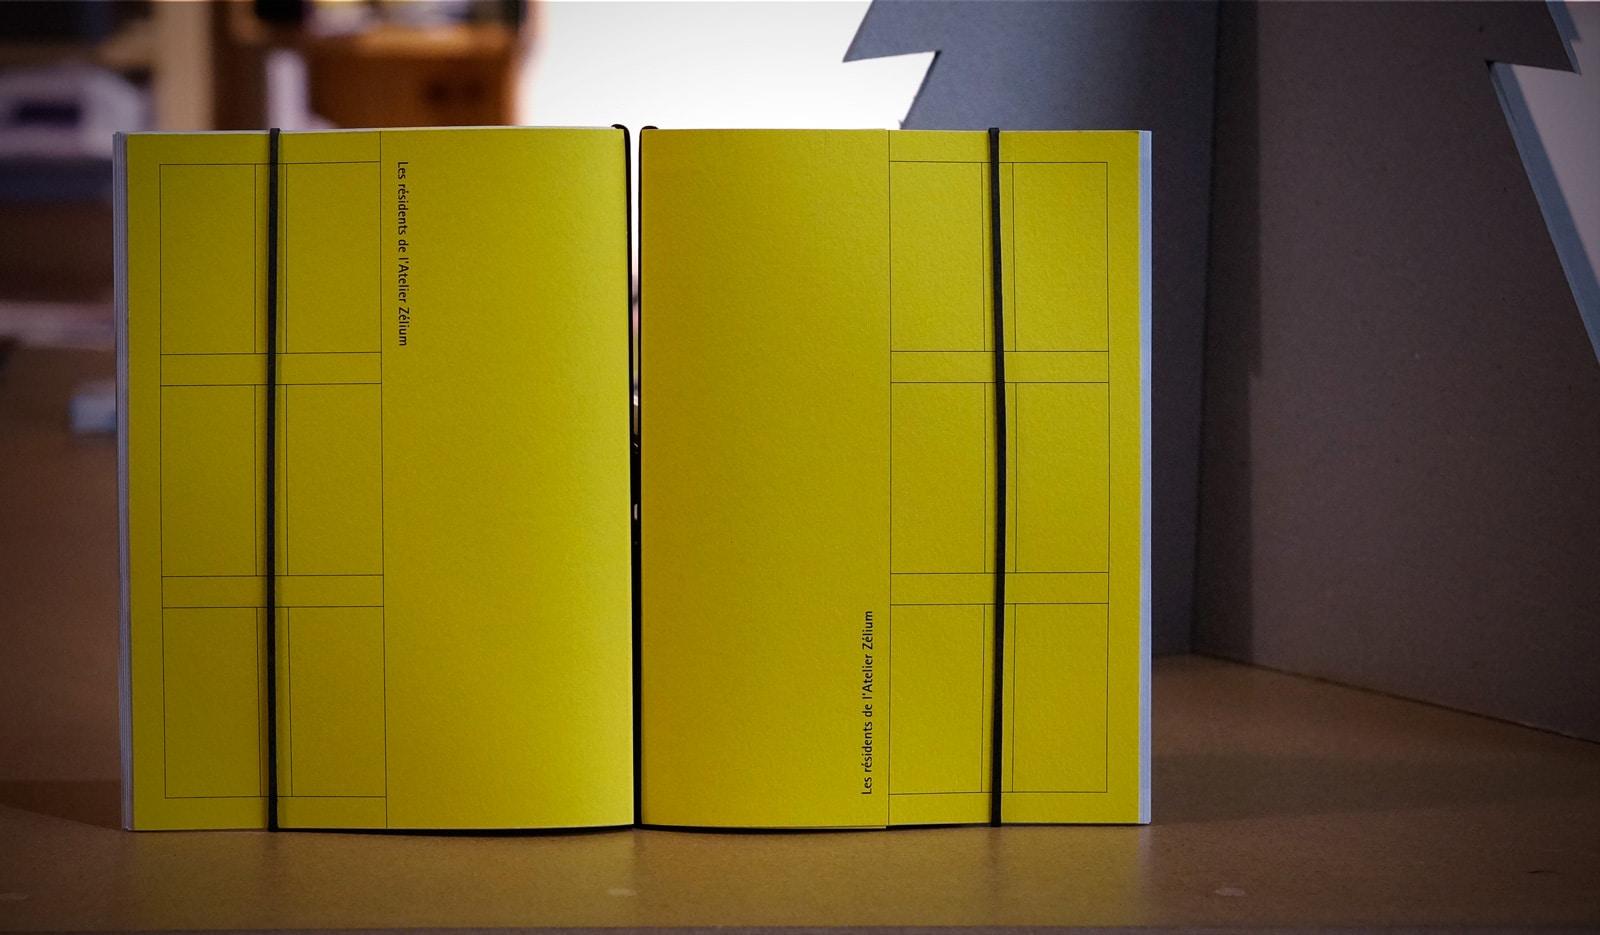 dossier-presse-jaune-encart-1-studio-octopus